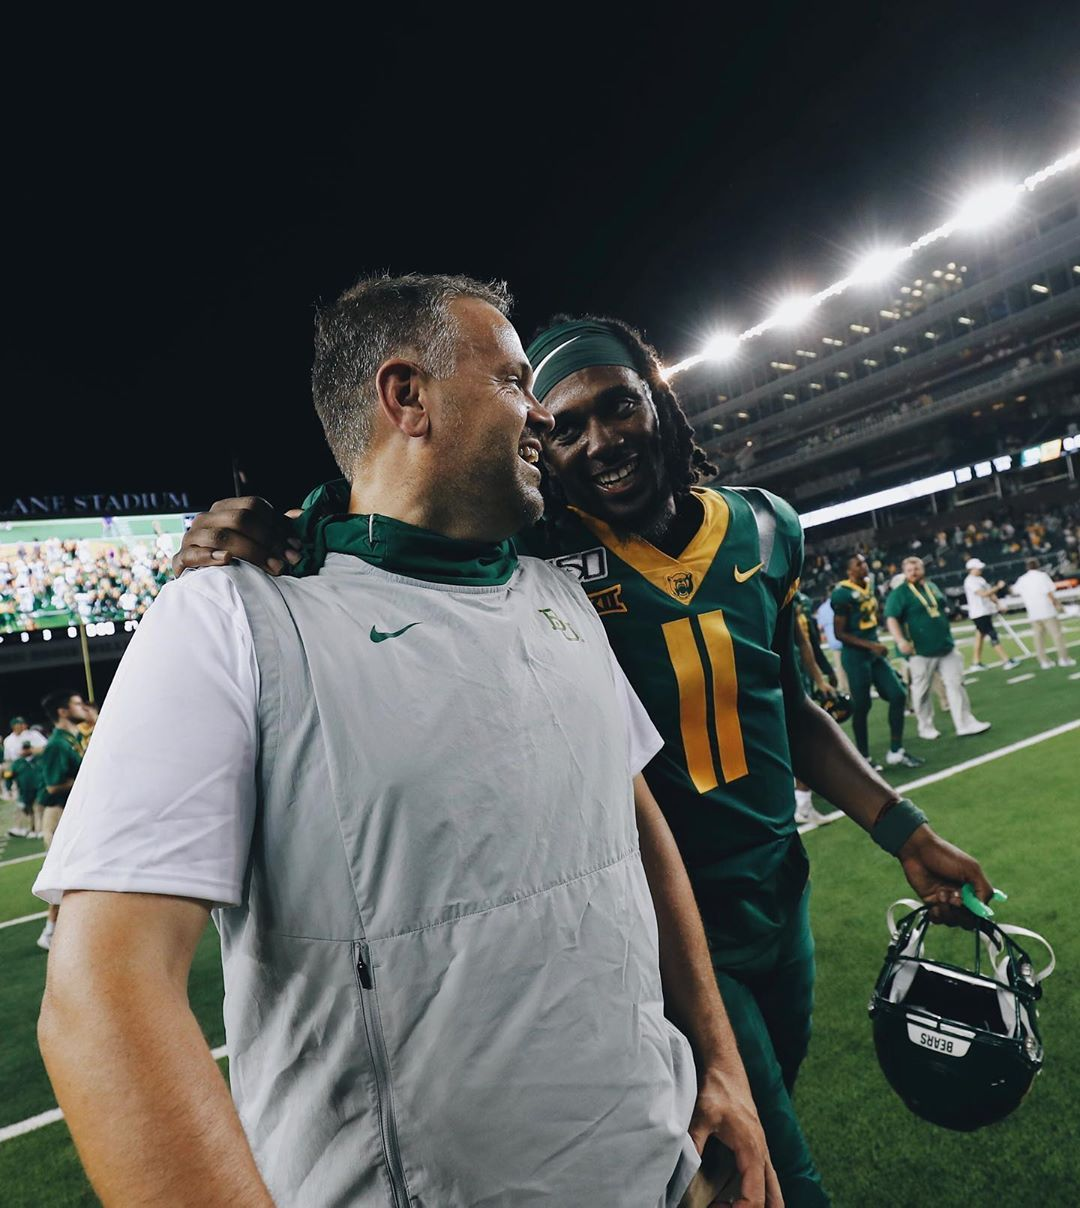 Matt Rhule, Baylor University head football coach, moves